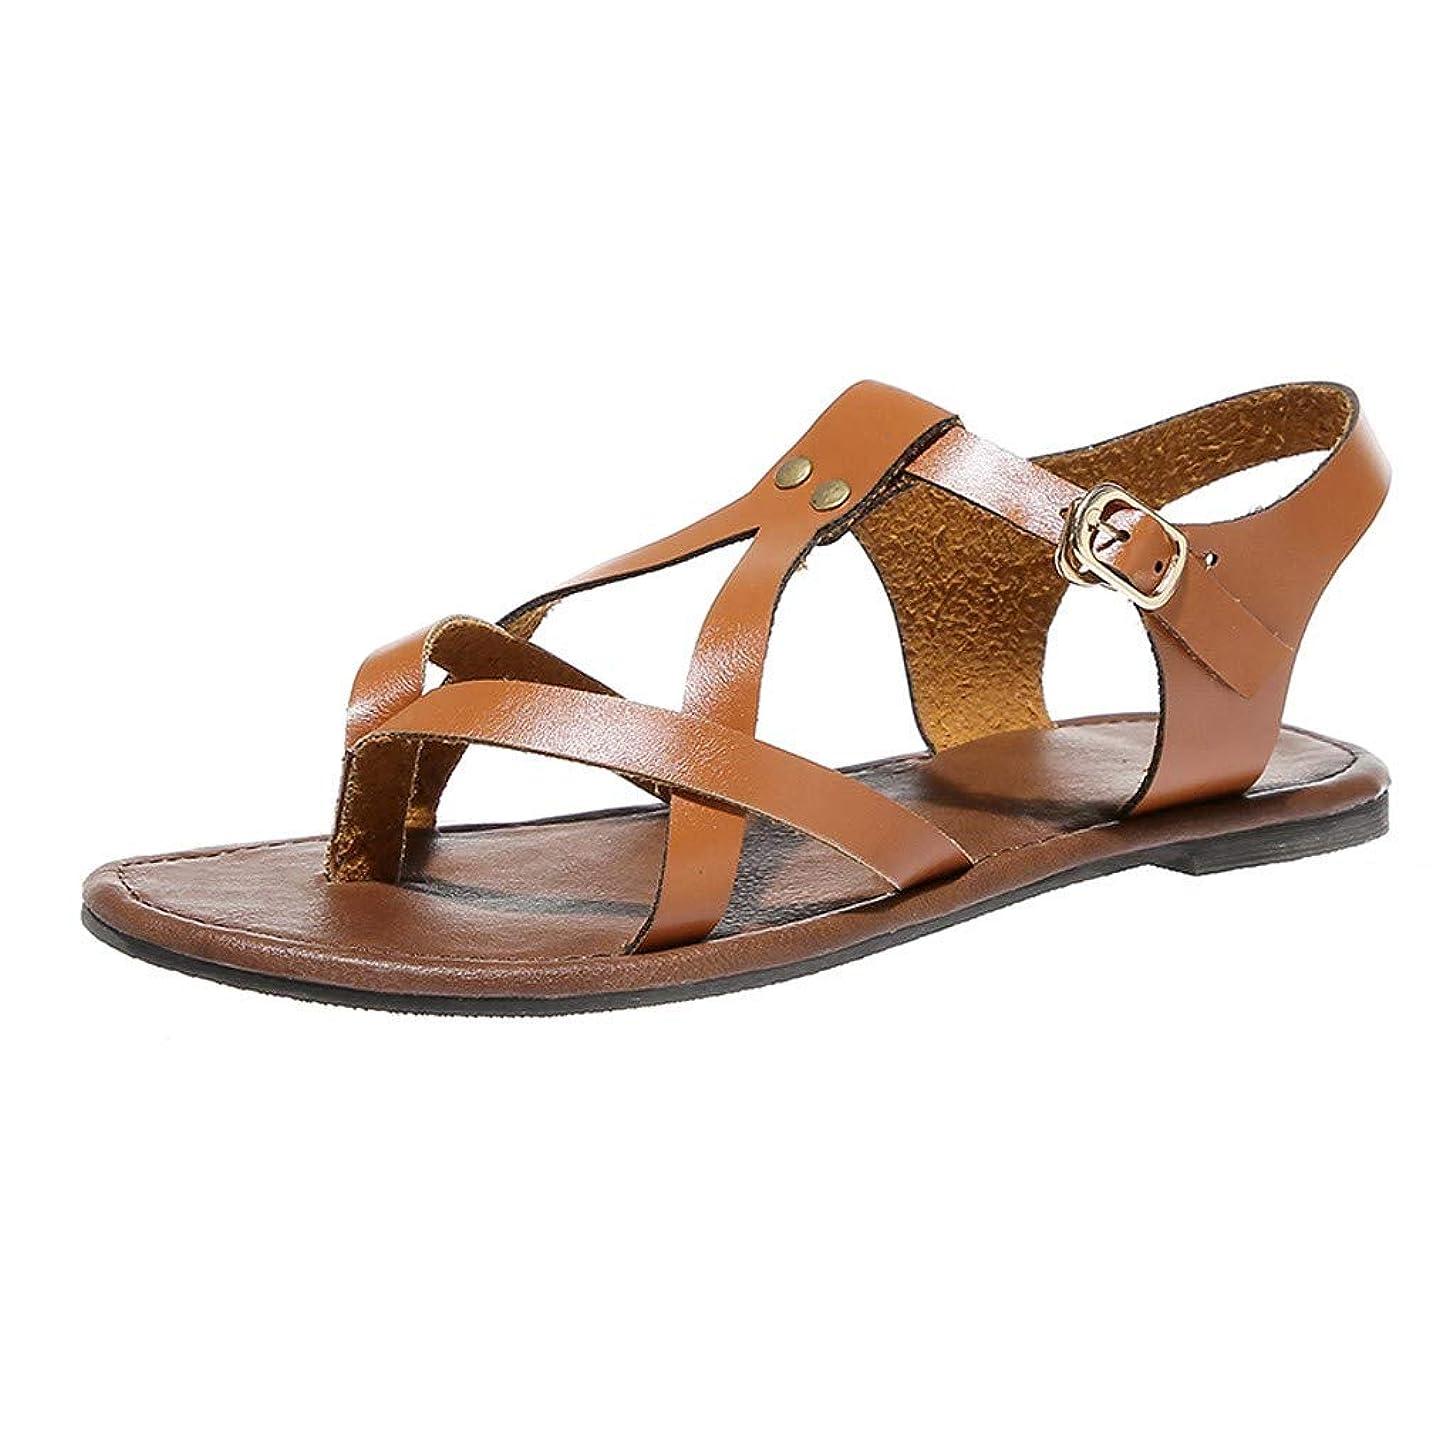 COOlCCI_2019 Women's Flat Sandal Criss-Cross Open Toe Wide Elastic Strap Fashion Summer Shoes Slippers